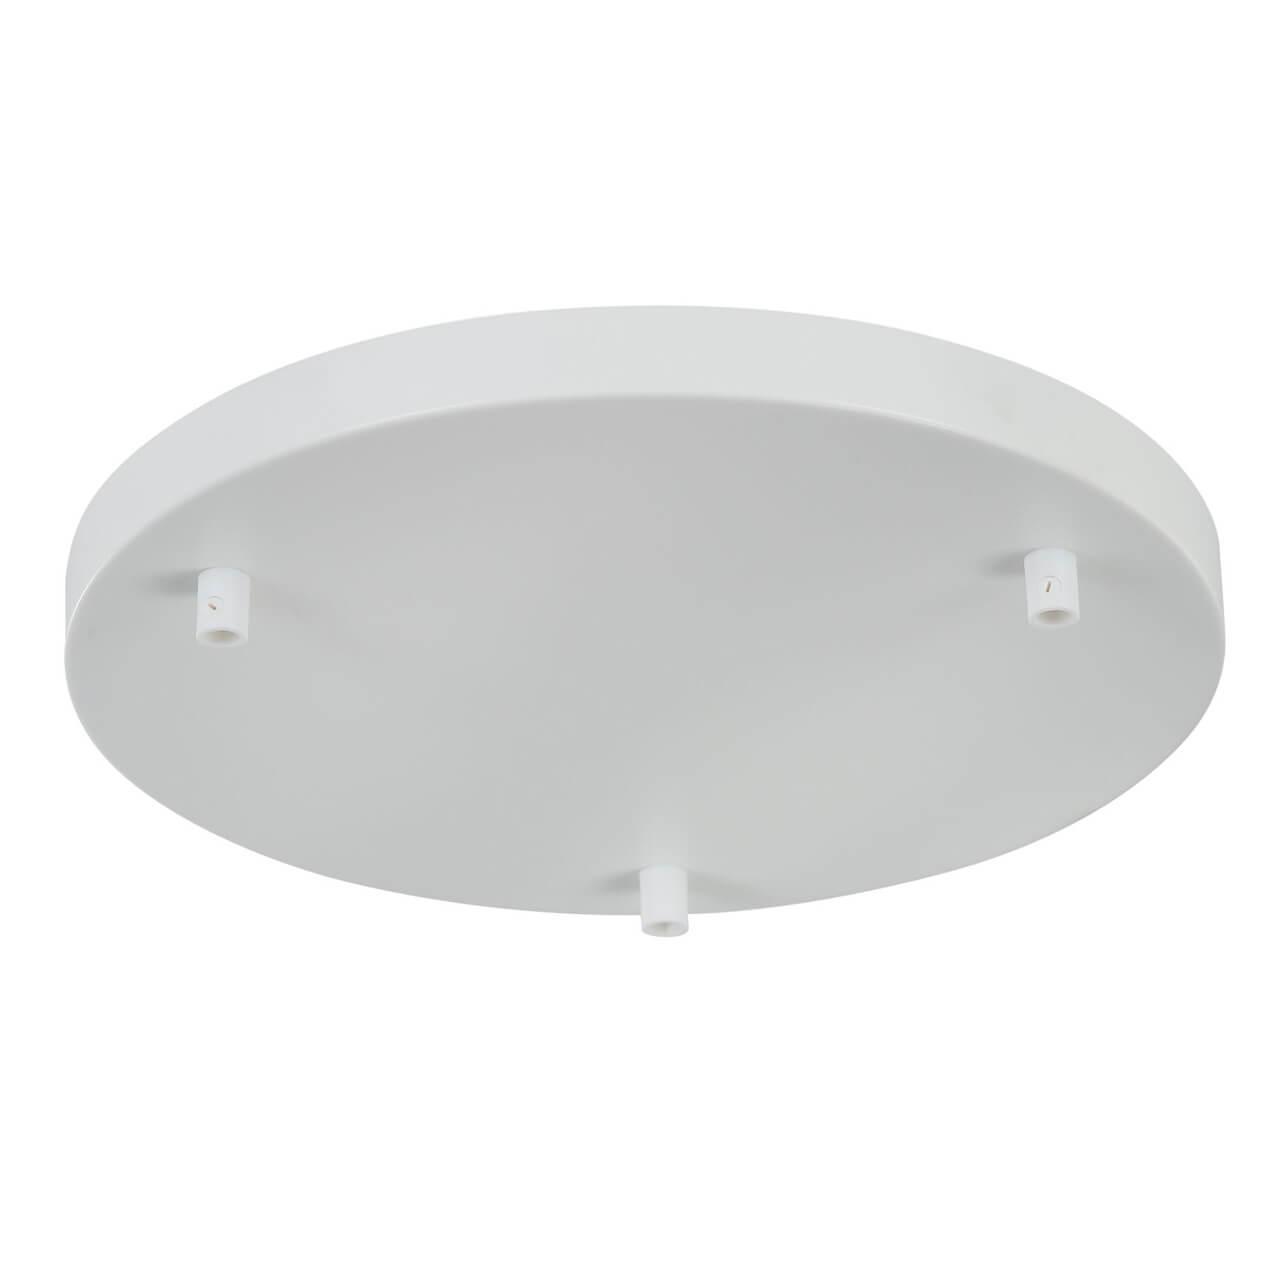 Основание для подвесной люстры Maytoni Universal Base SPR-BASE-R-03-W цена